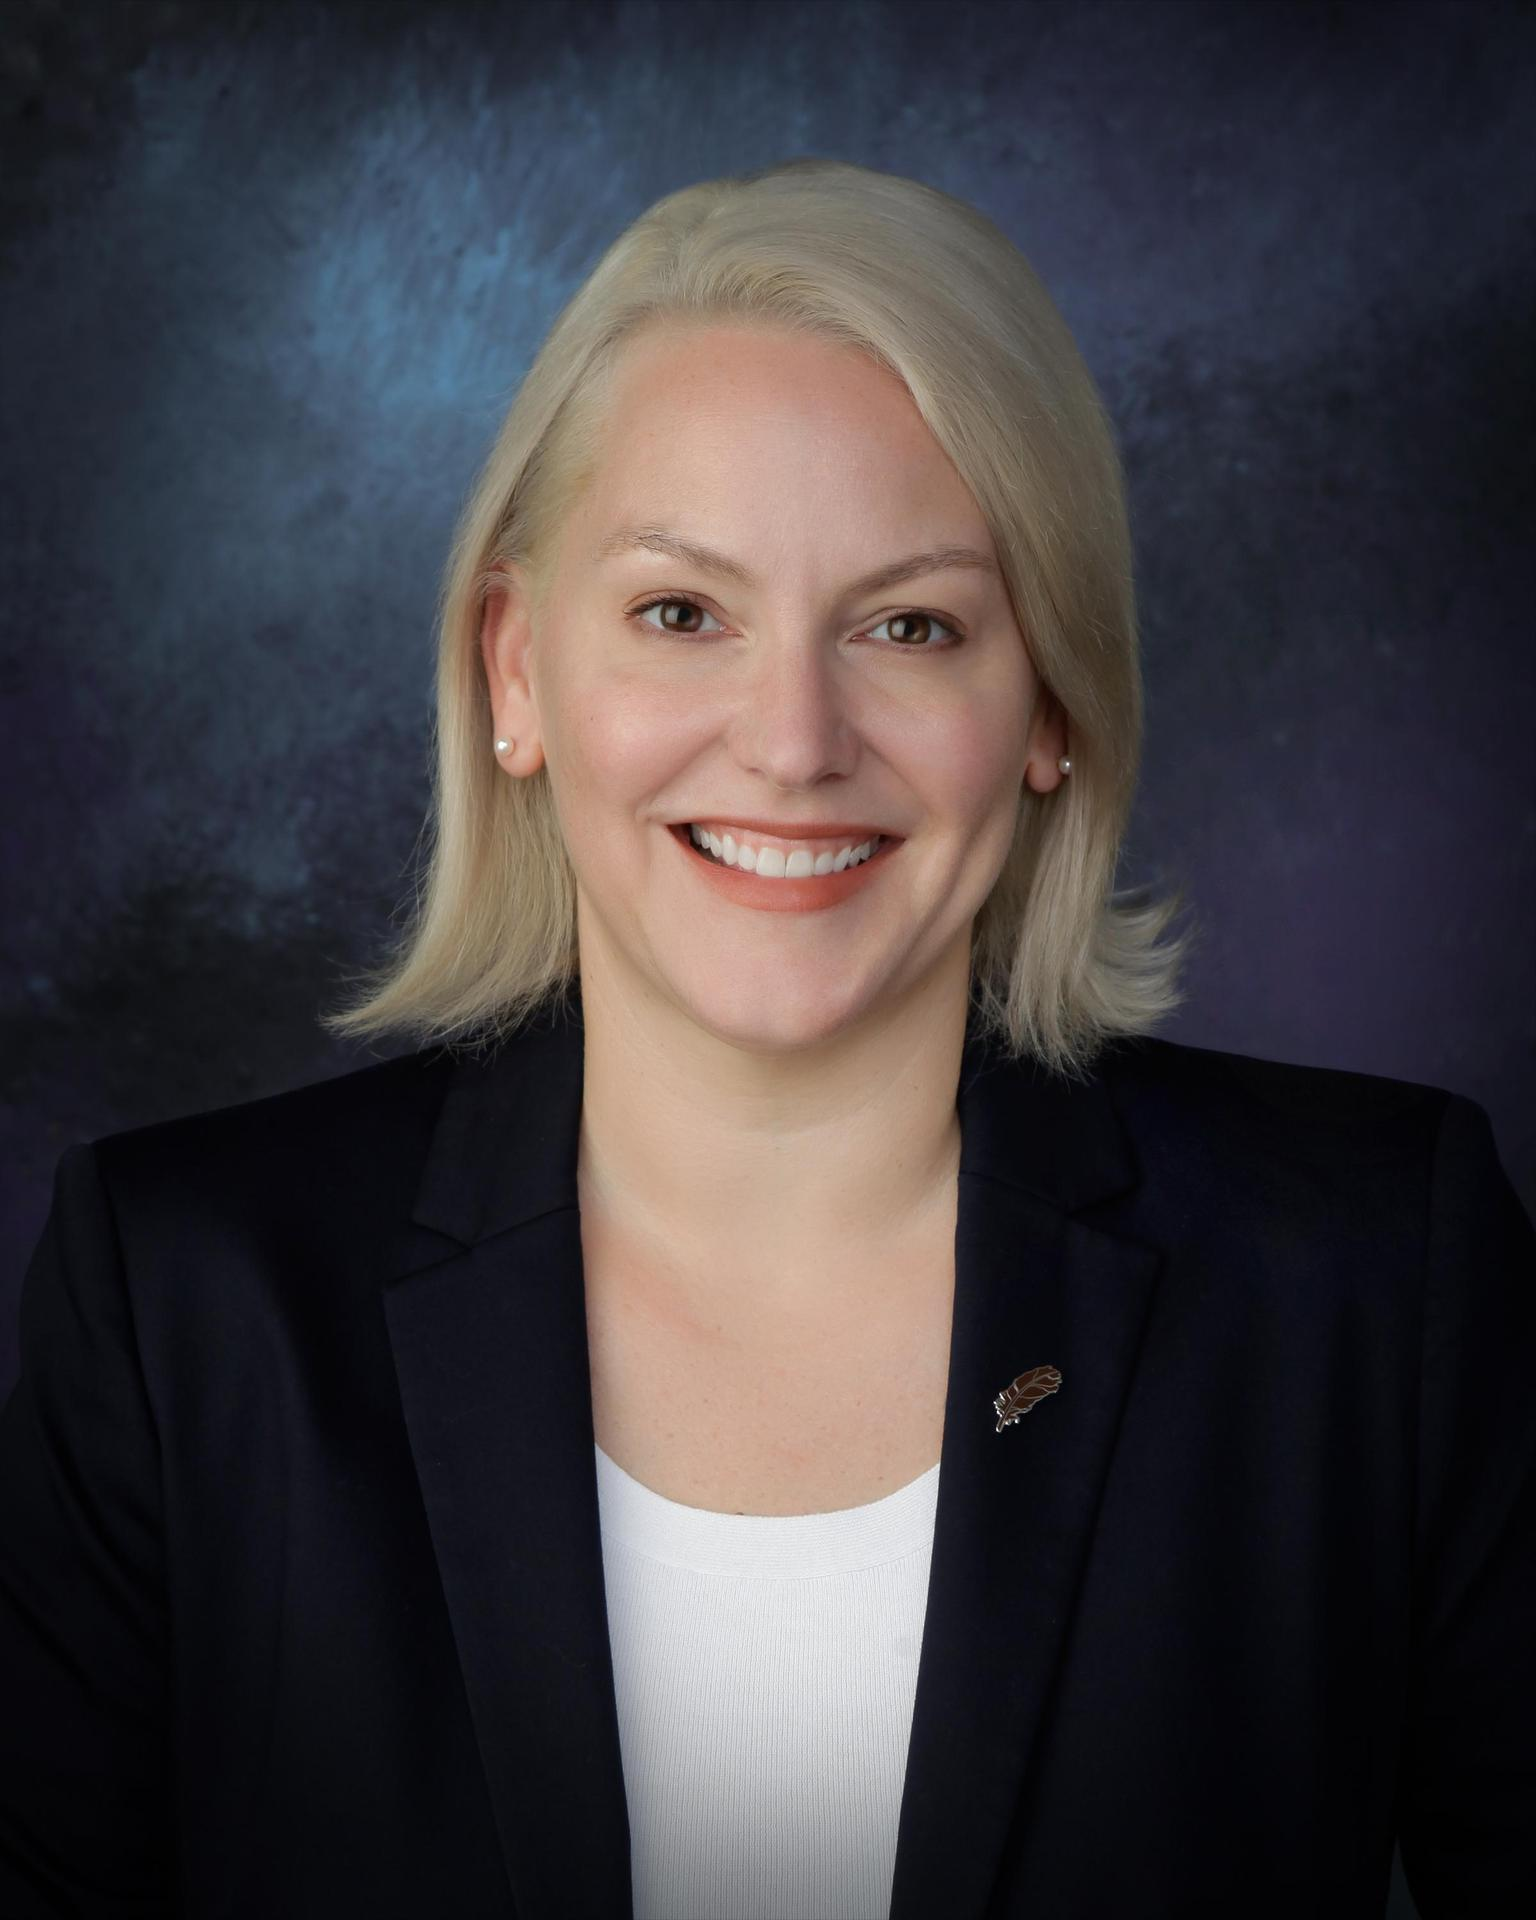 Angie Dillman, AHS Principal